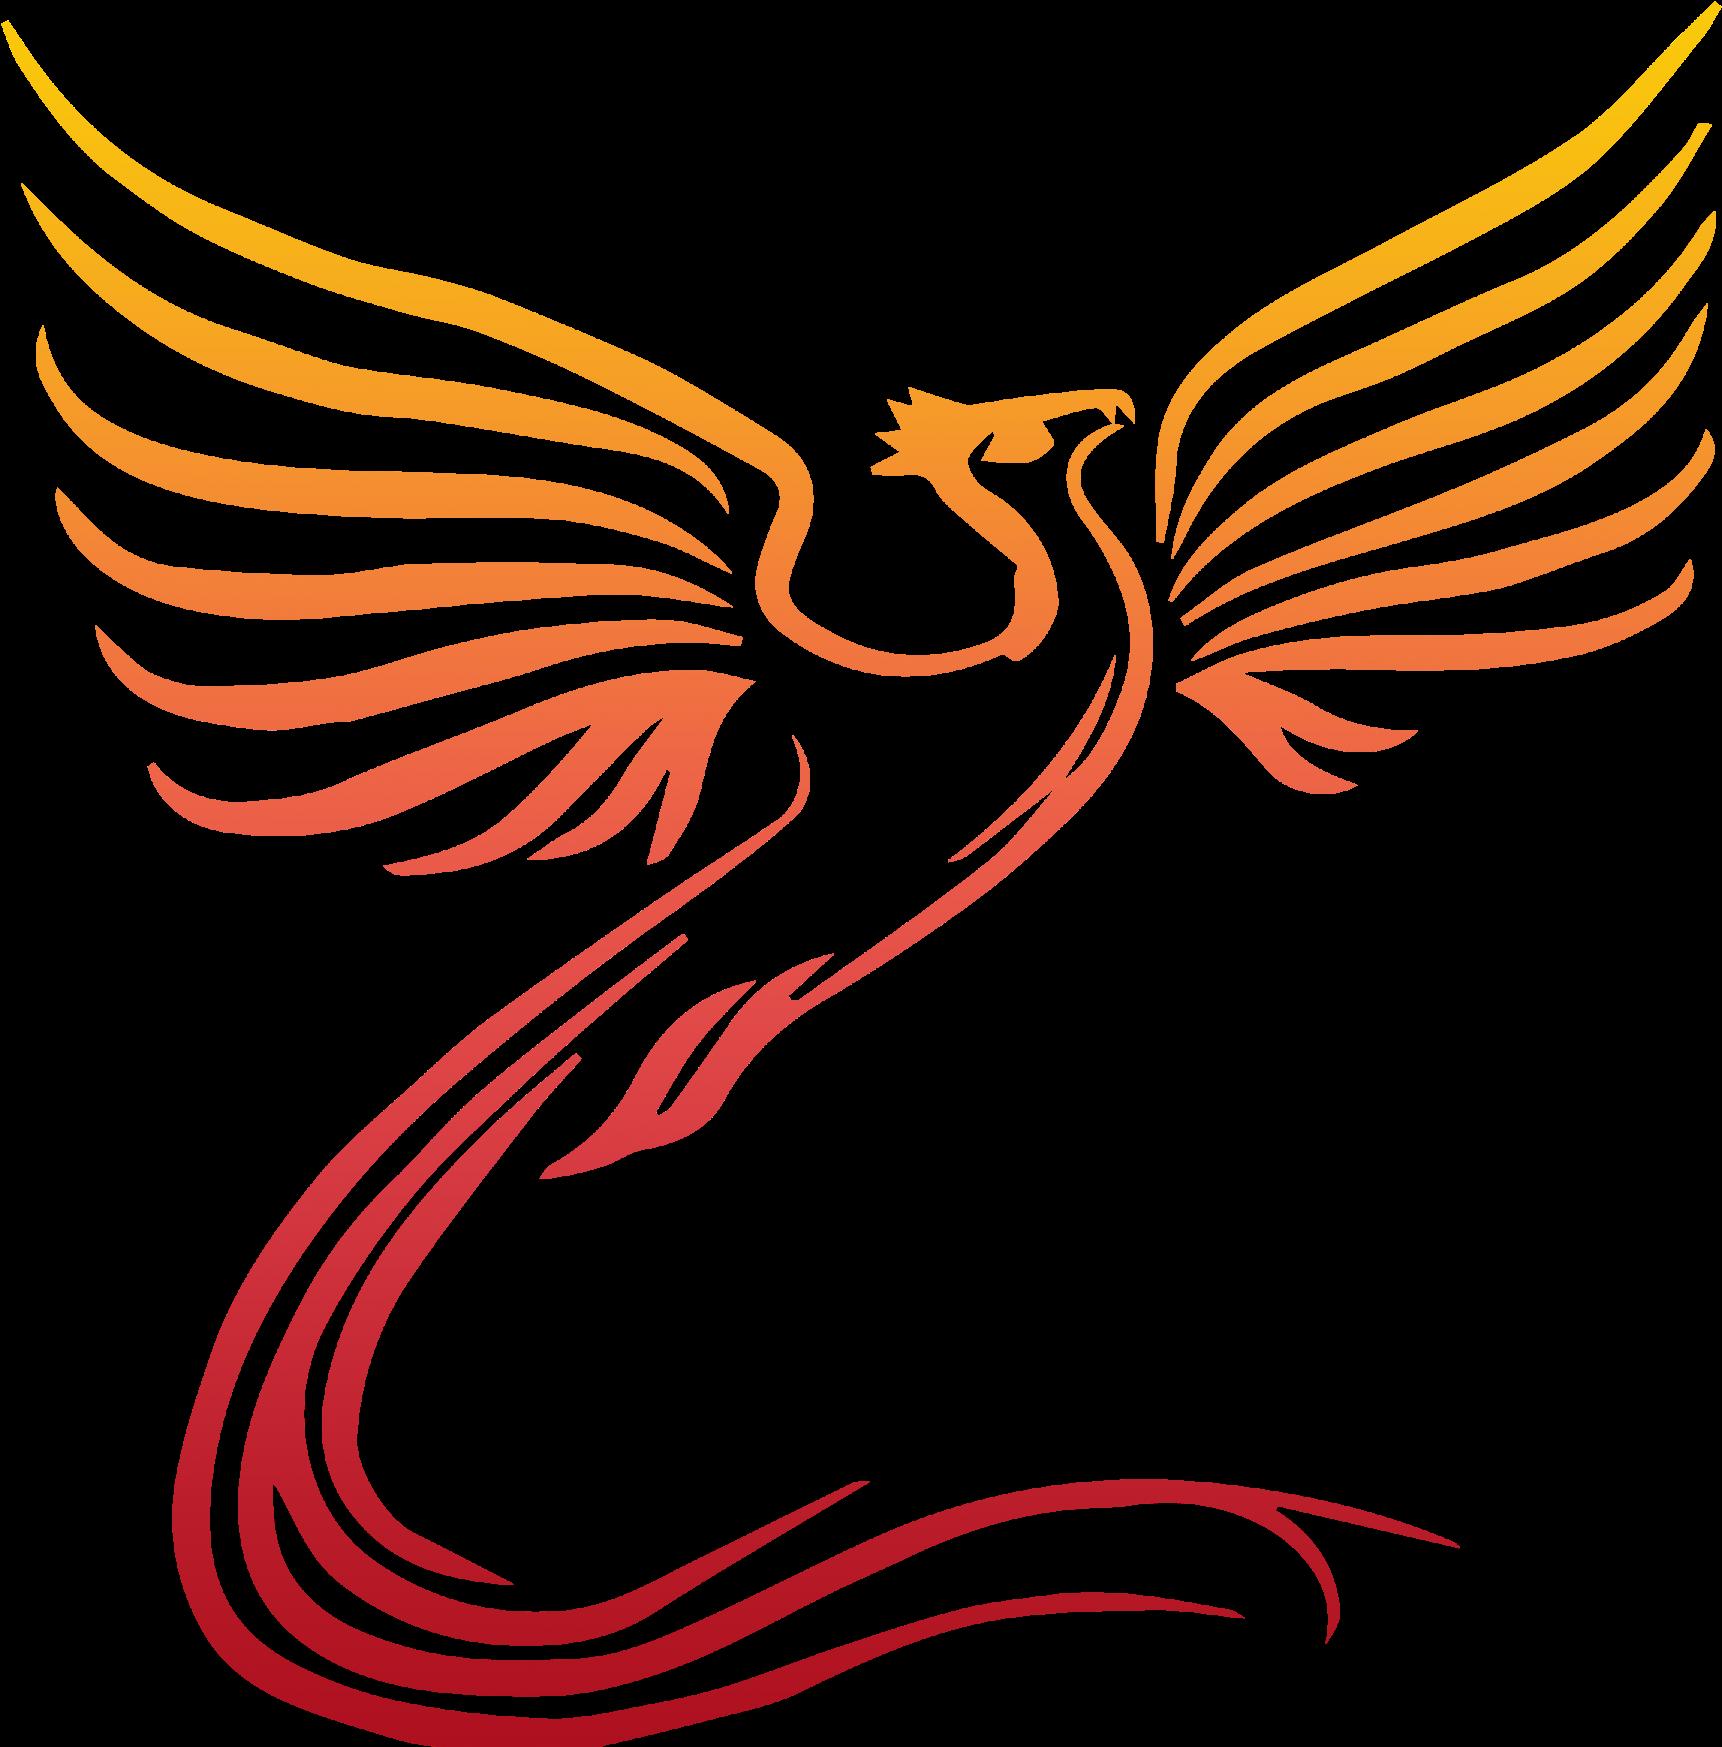 пляжа птица феникс картинка в векторе наличии